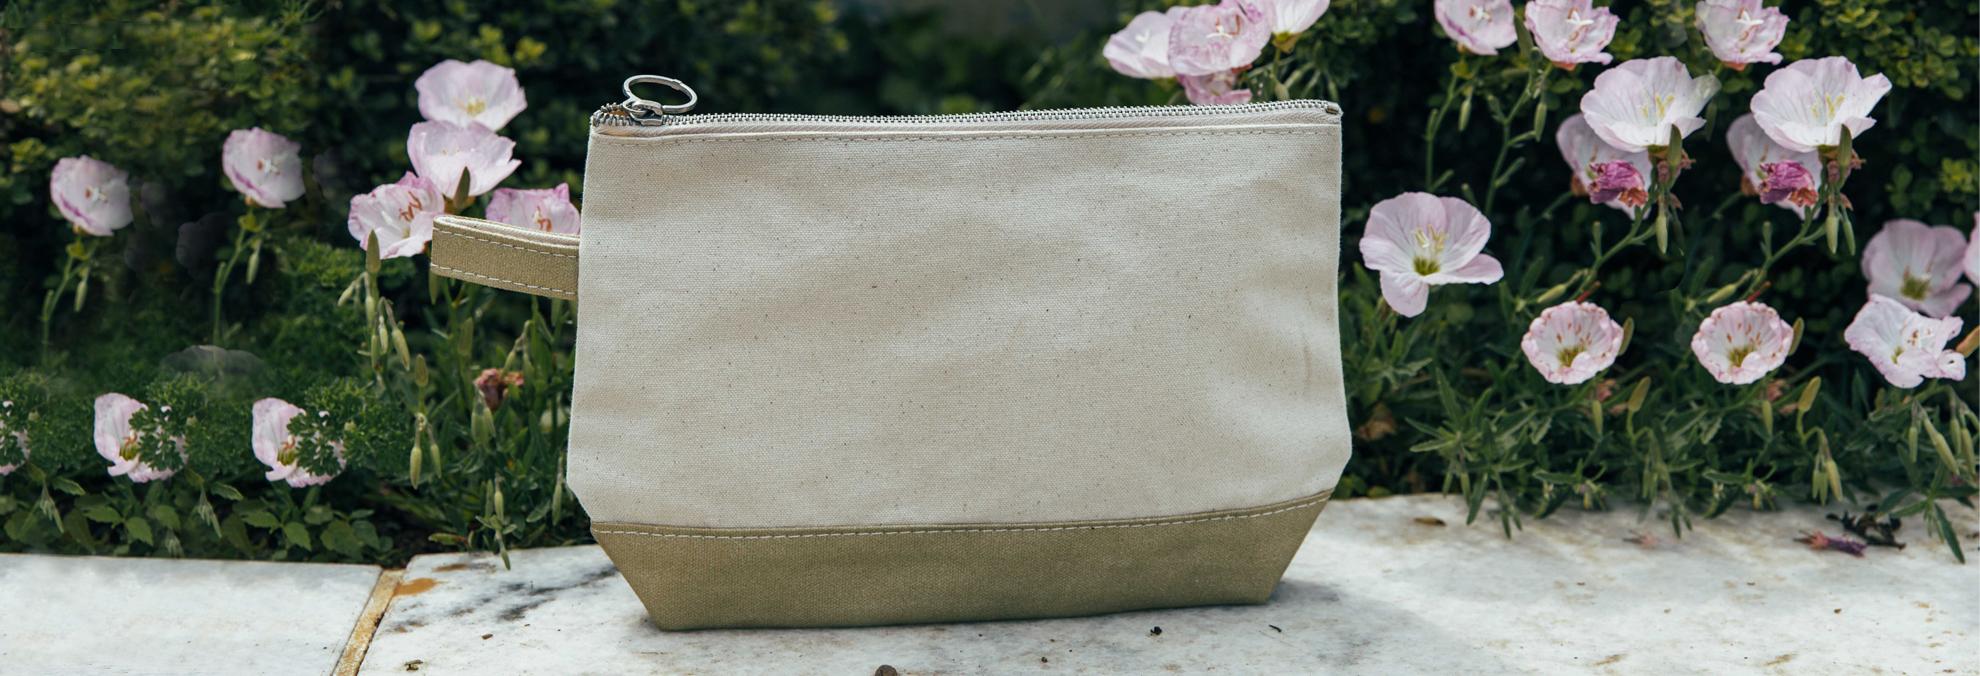 Cosmetic Bags